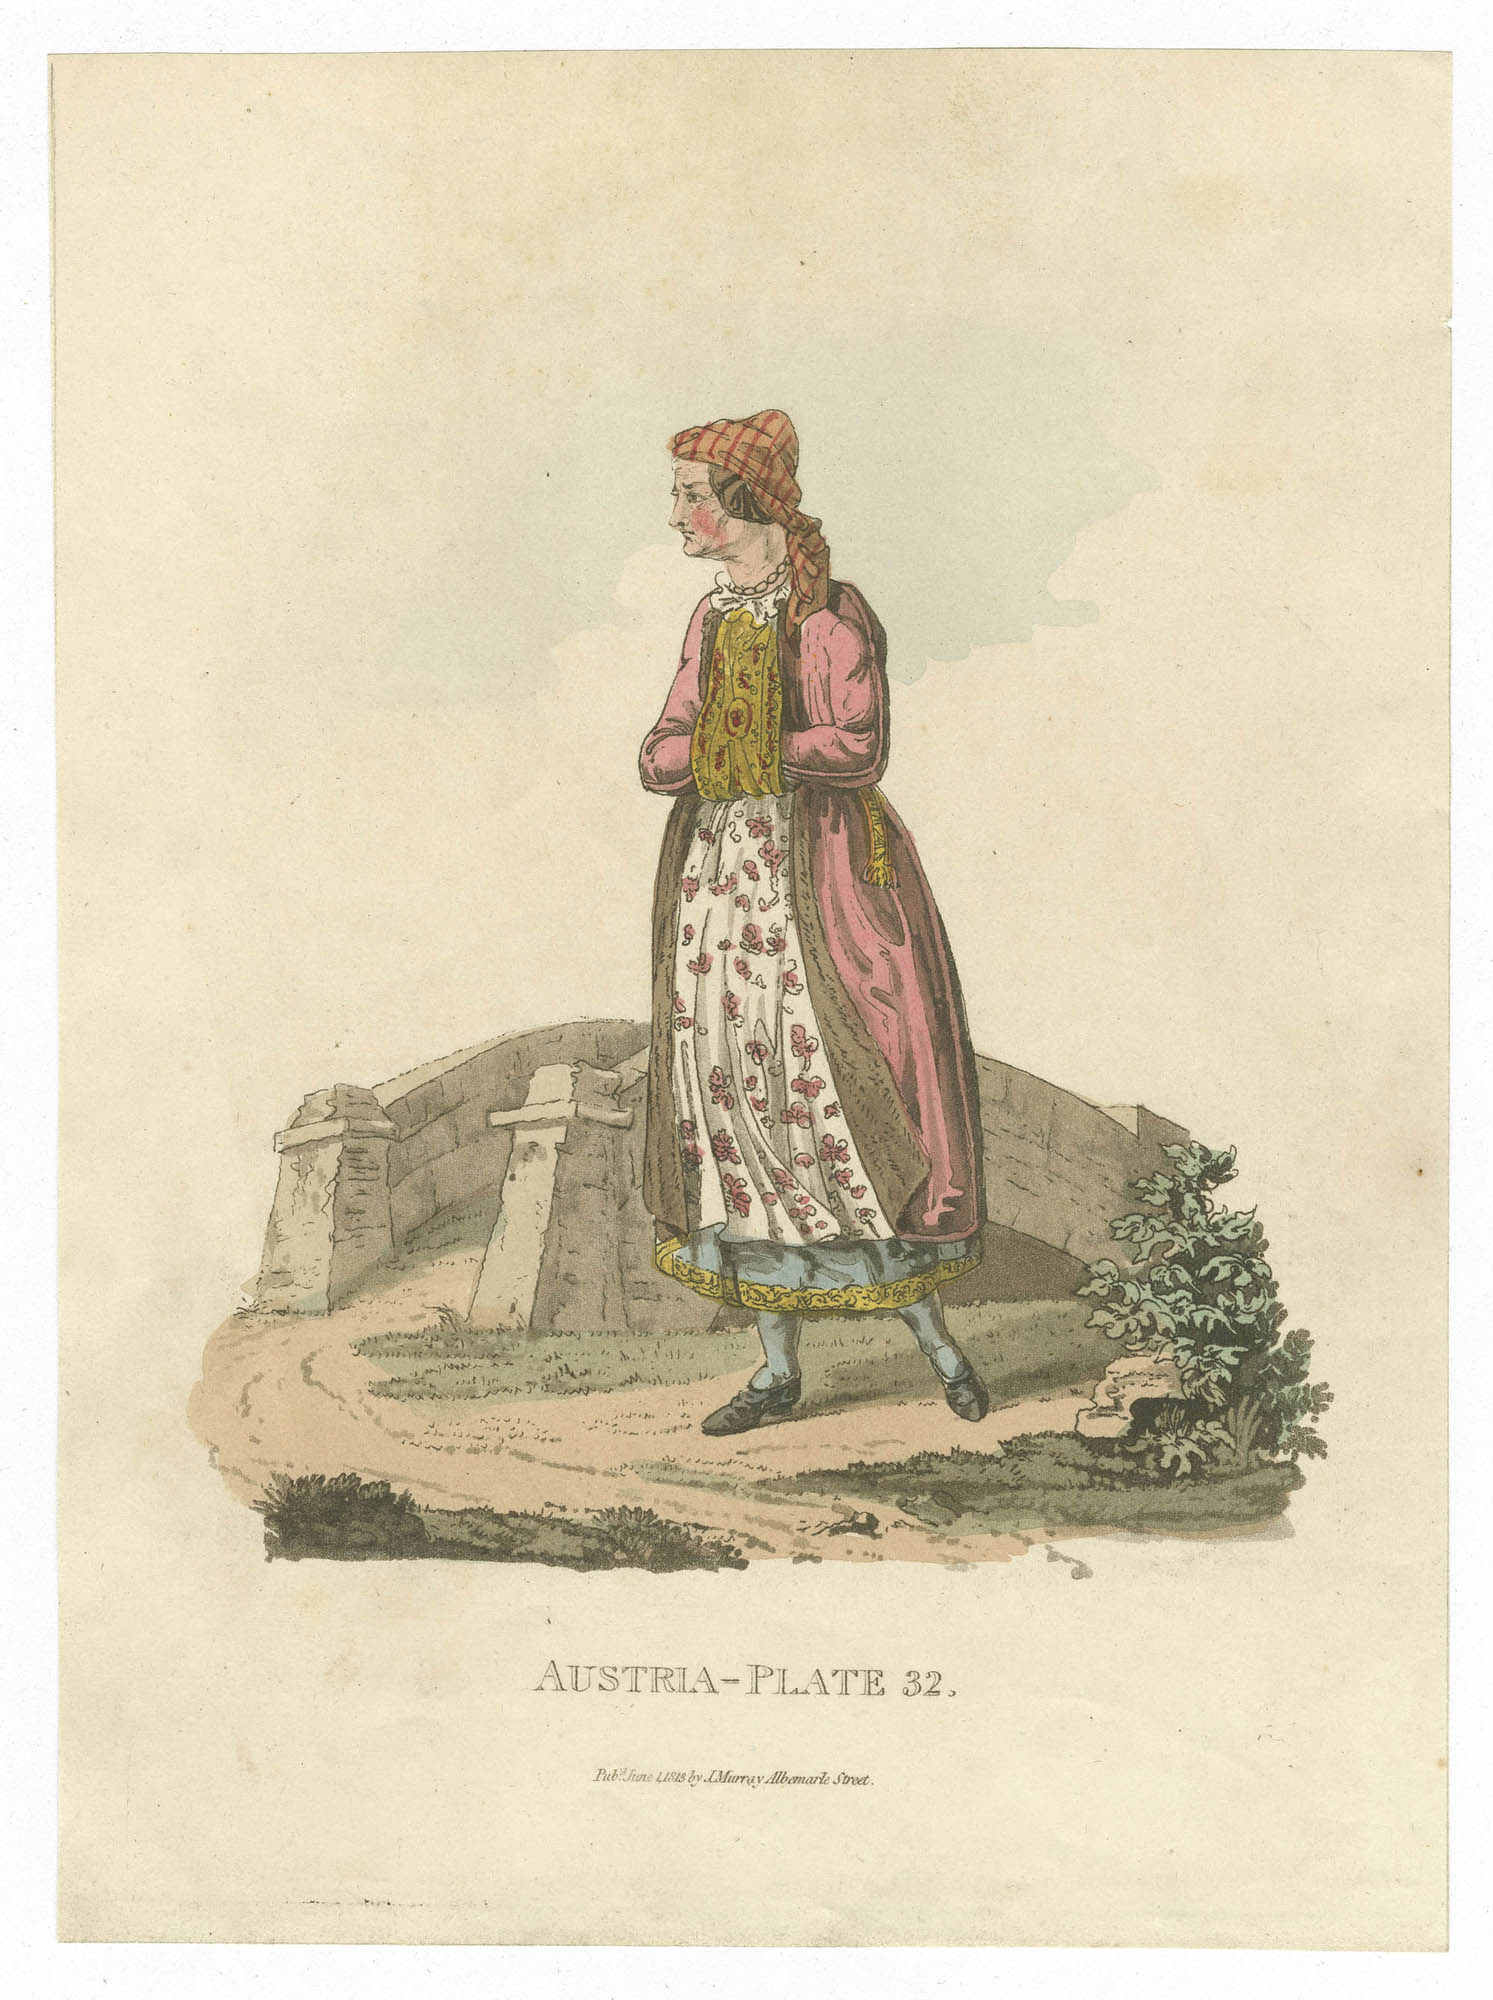 Austria--Plate 32